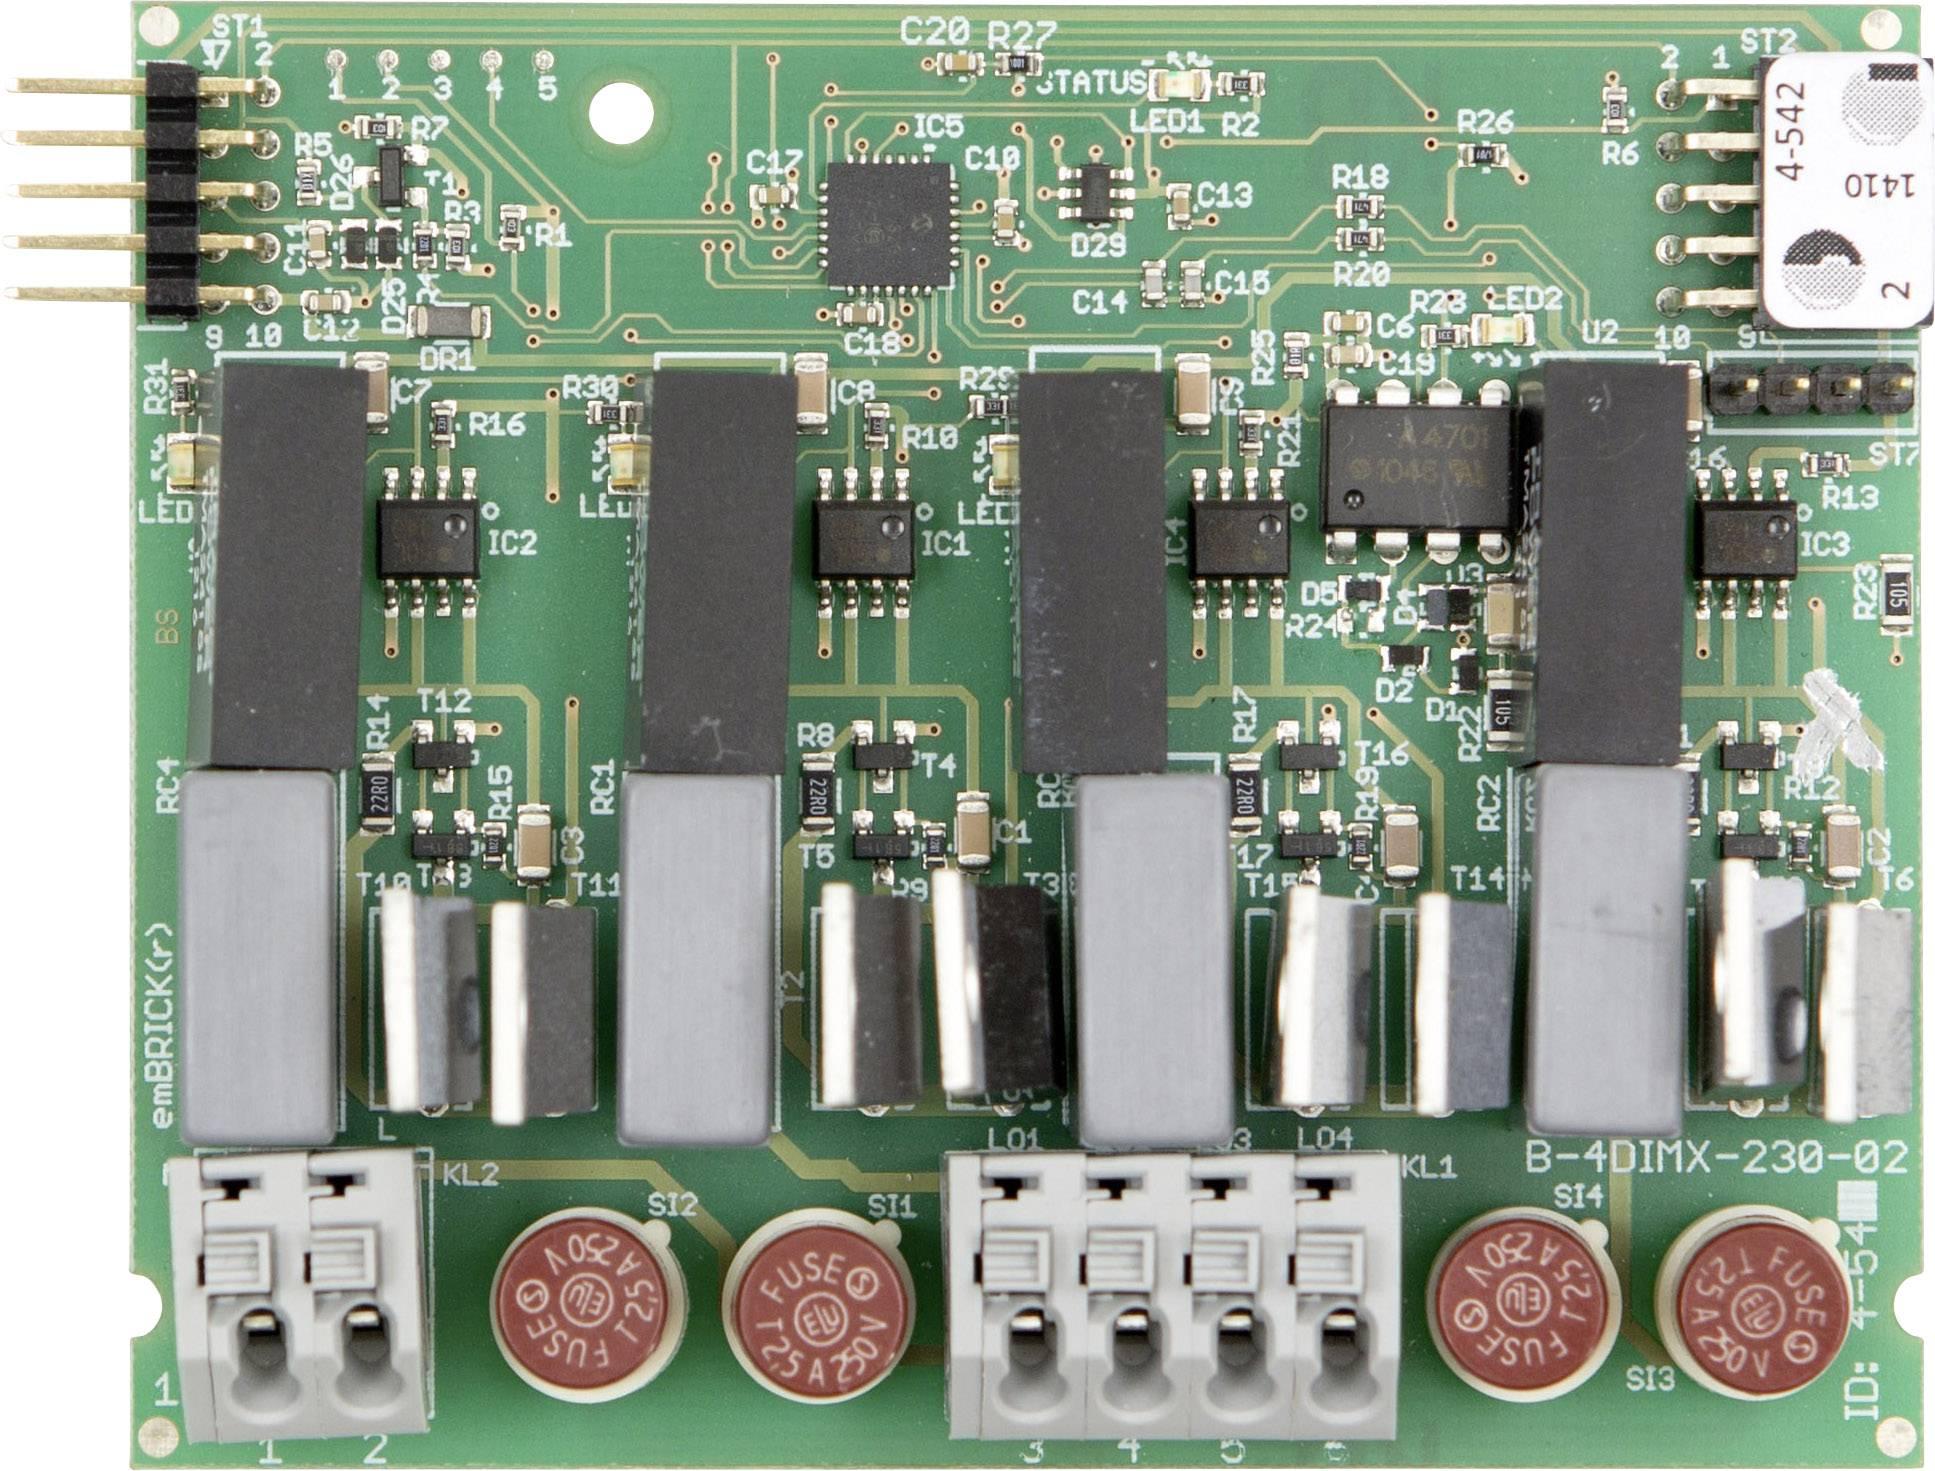 PLC modul emBRICK B-4Dim230T-01